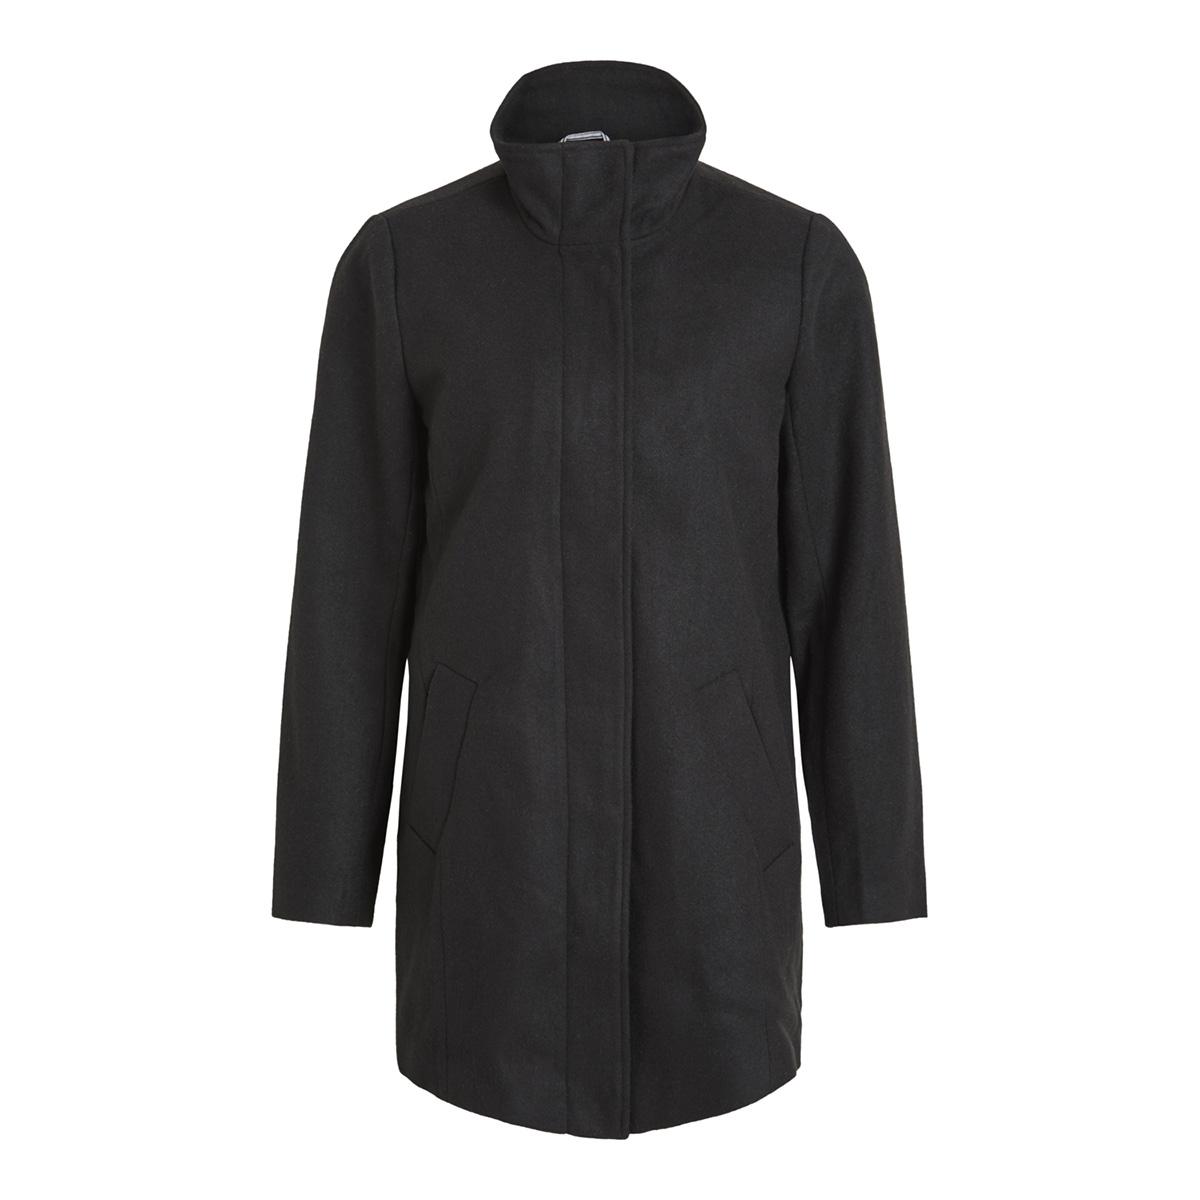 objsasha nora coat noos 23027422 object jas black